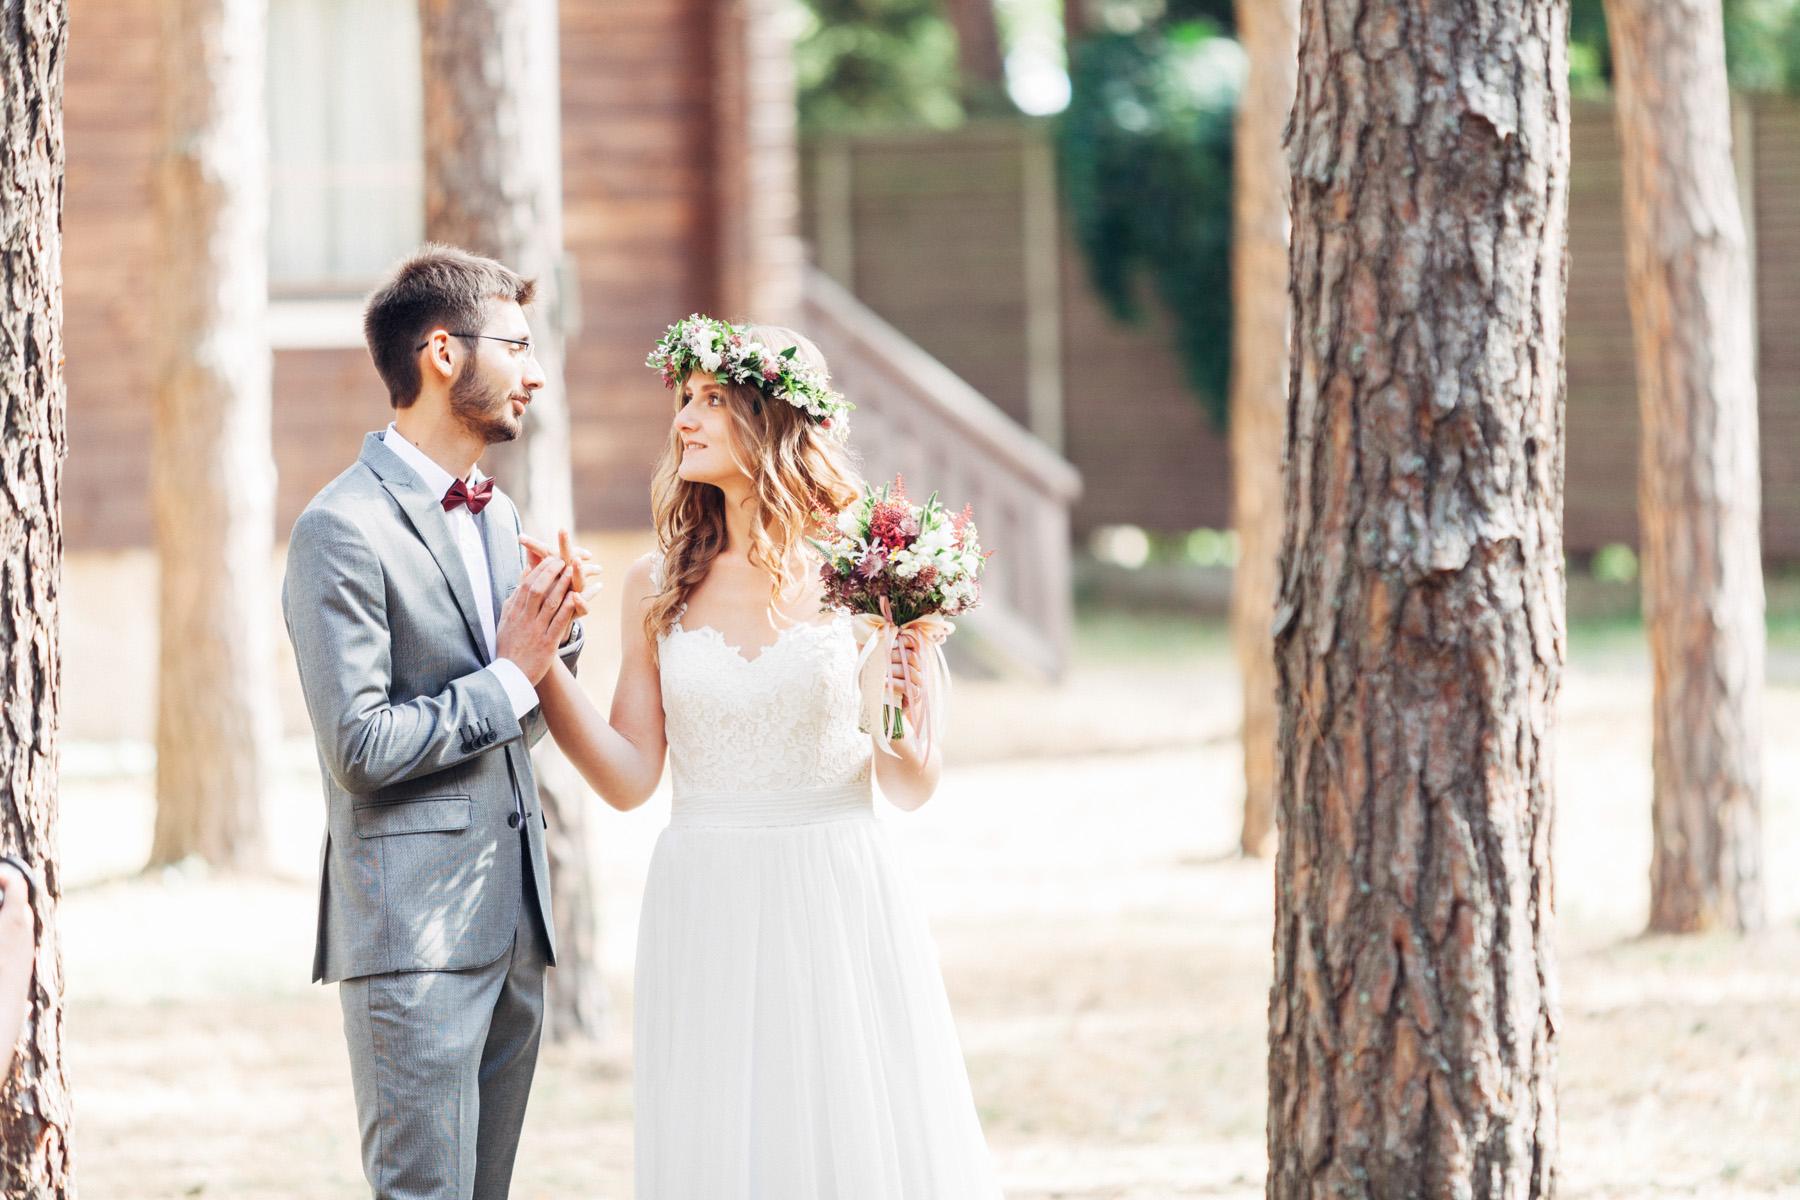 Свадебное портфолио лавстори